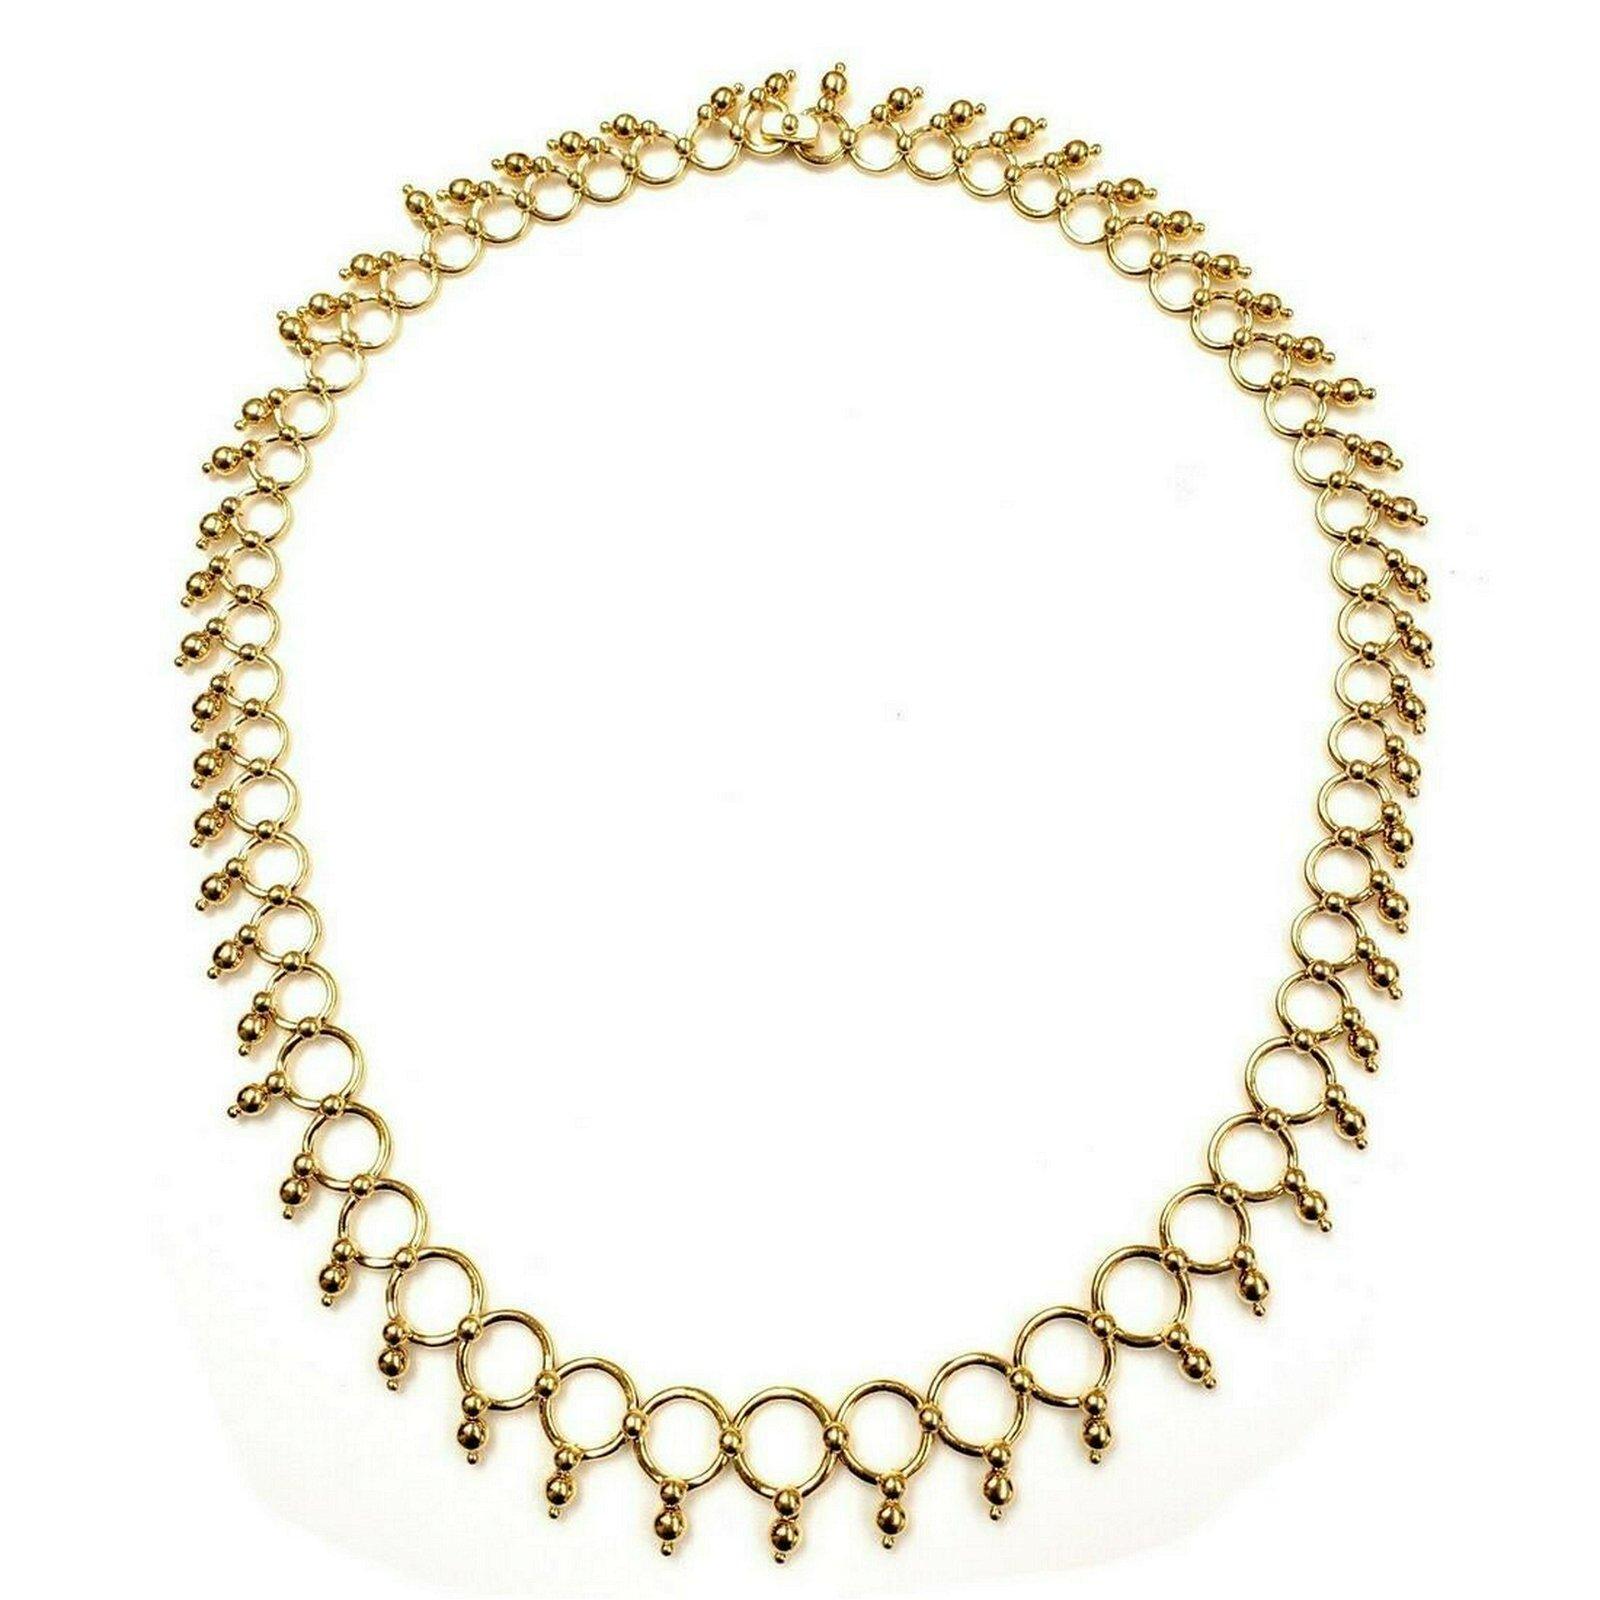 Tiffany & Co. 18K Gold Kashmir Necklace